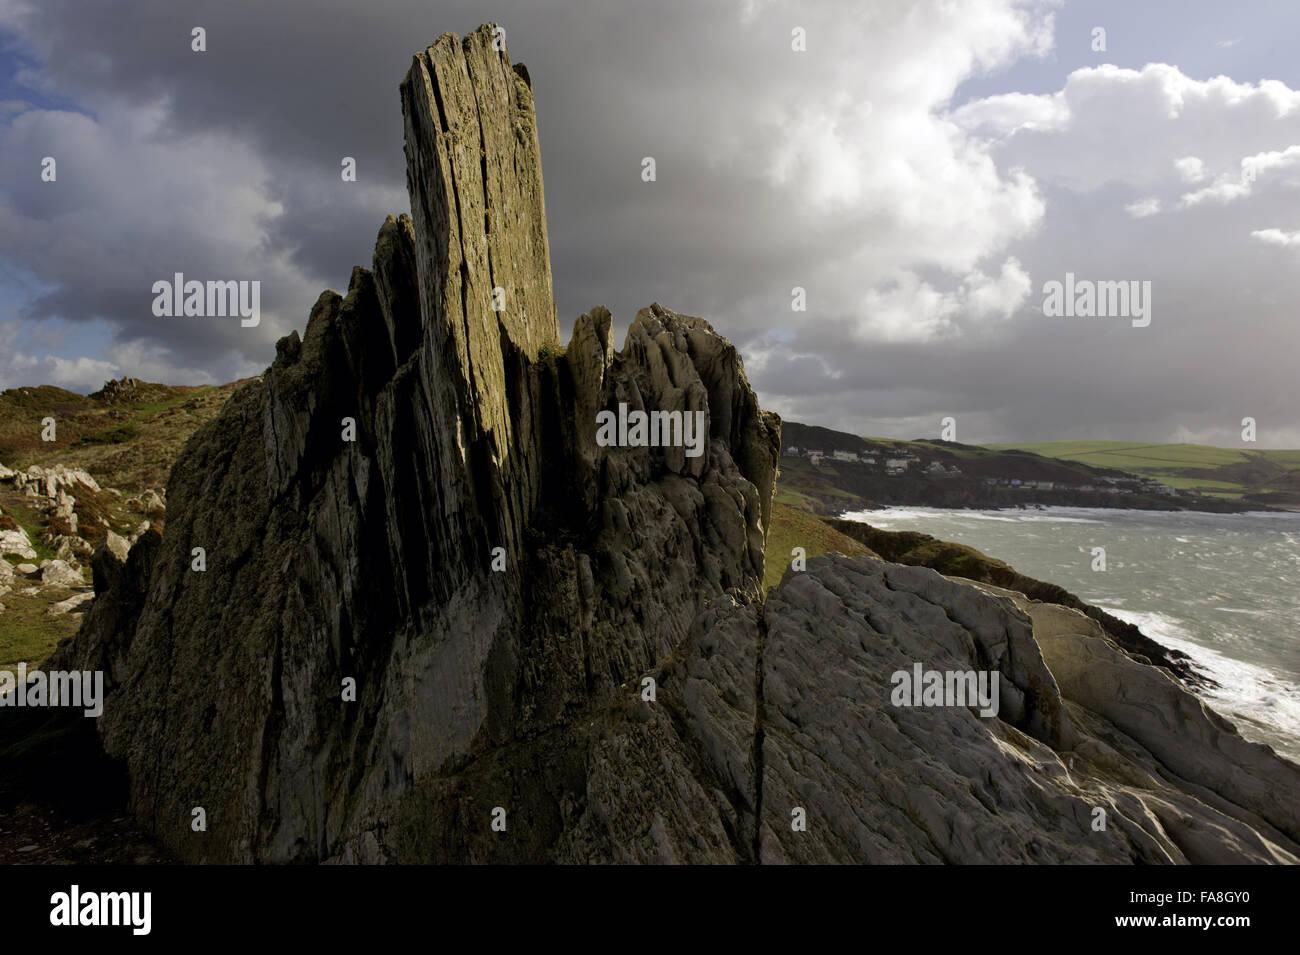 Rocks at Morte Point, North Devon. - Stock Image